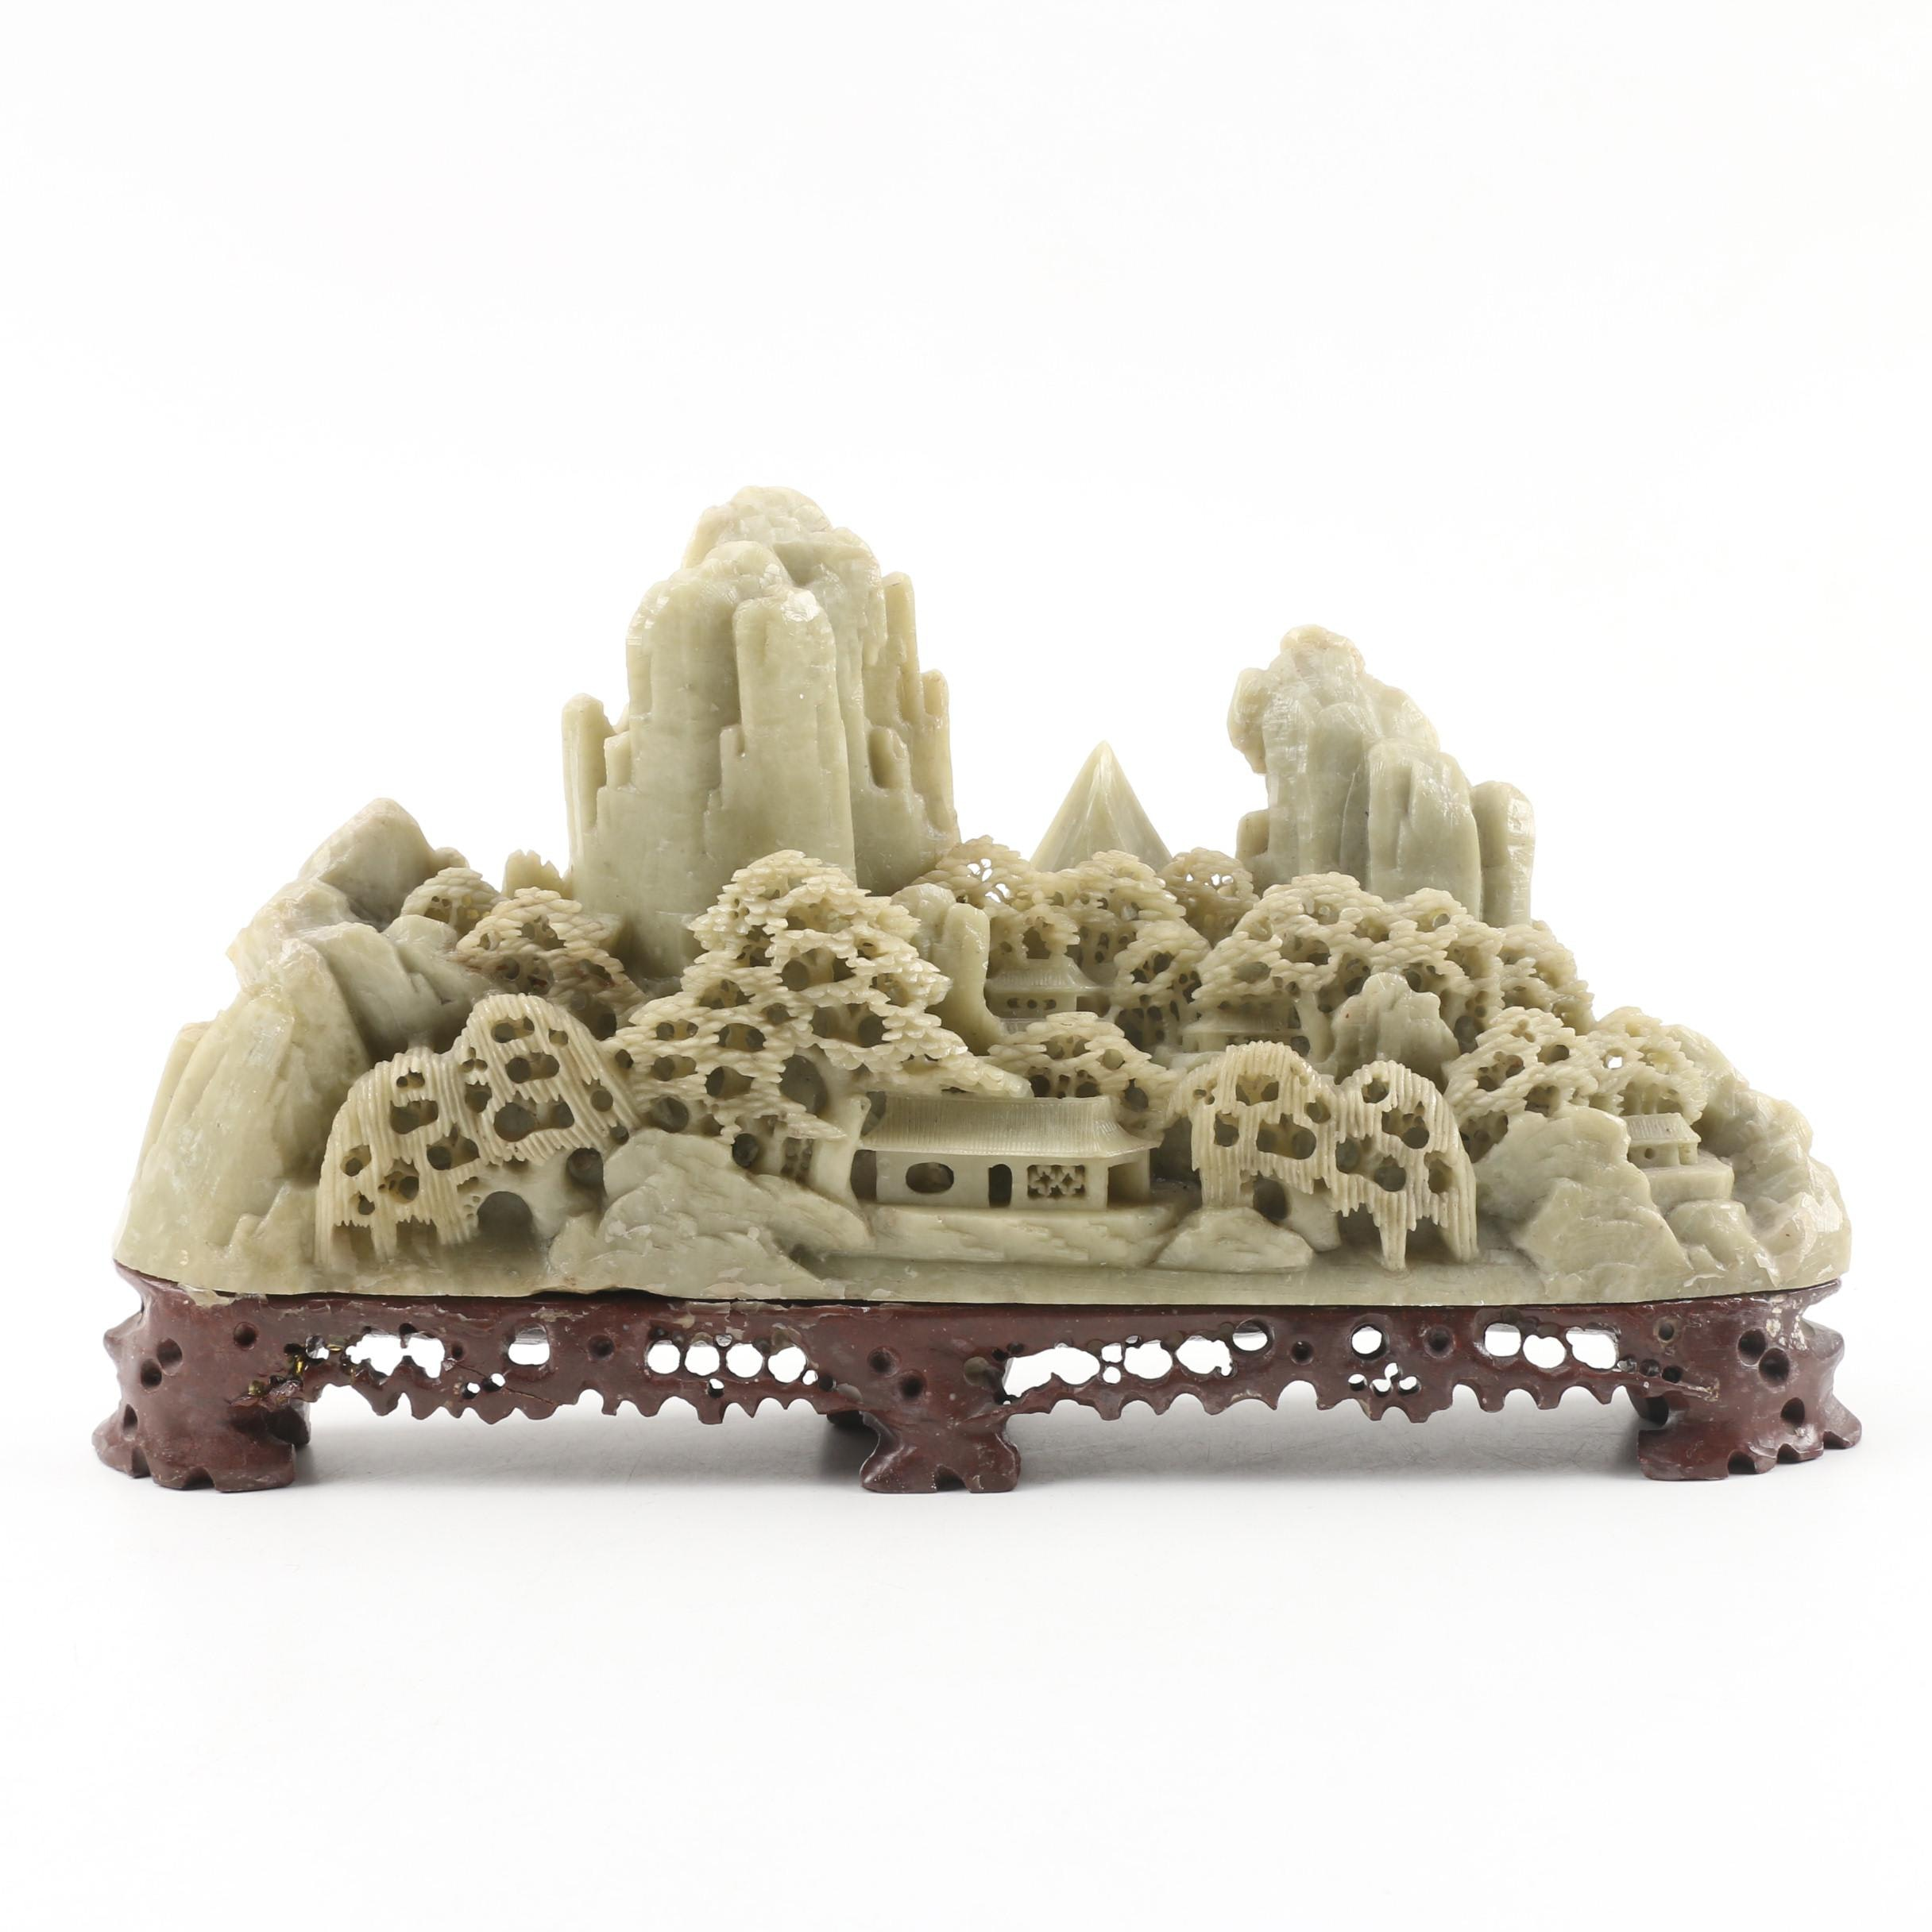 Chinese Carved Soapstone Shoushan Figurine with Base